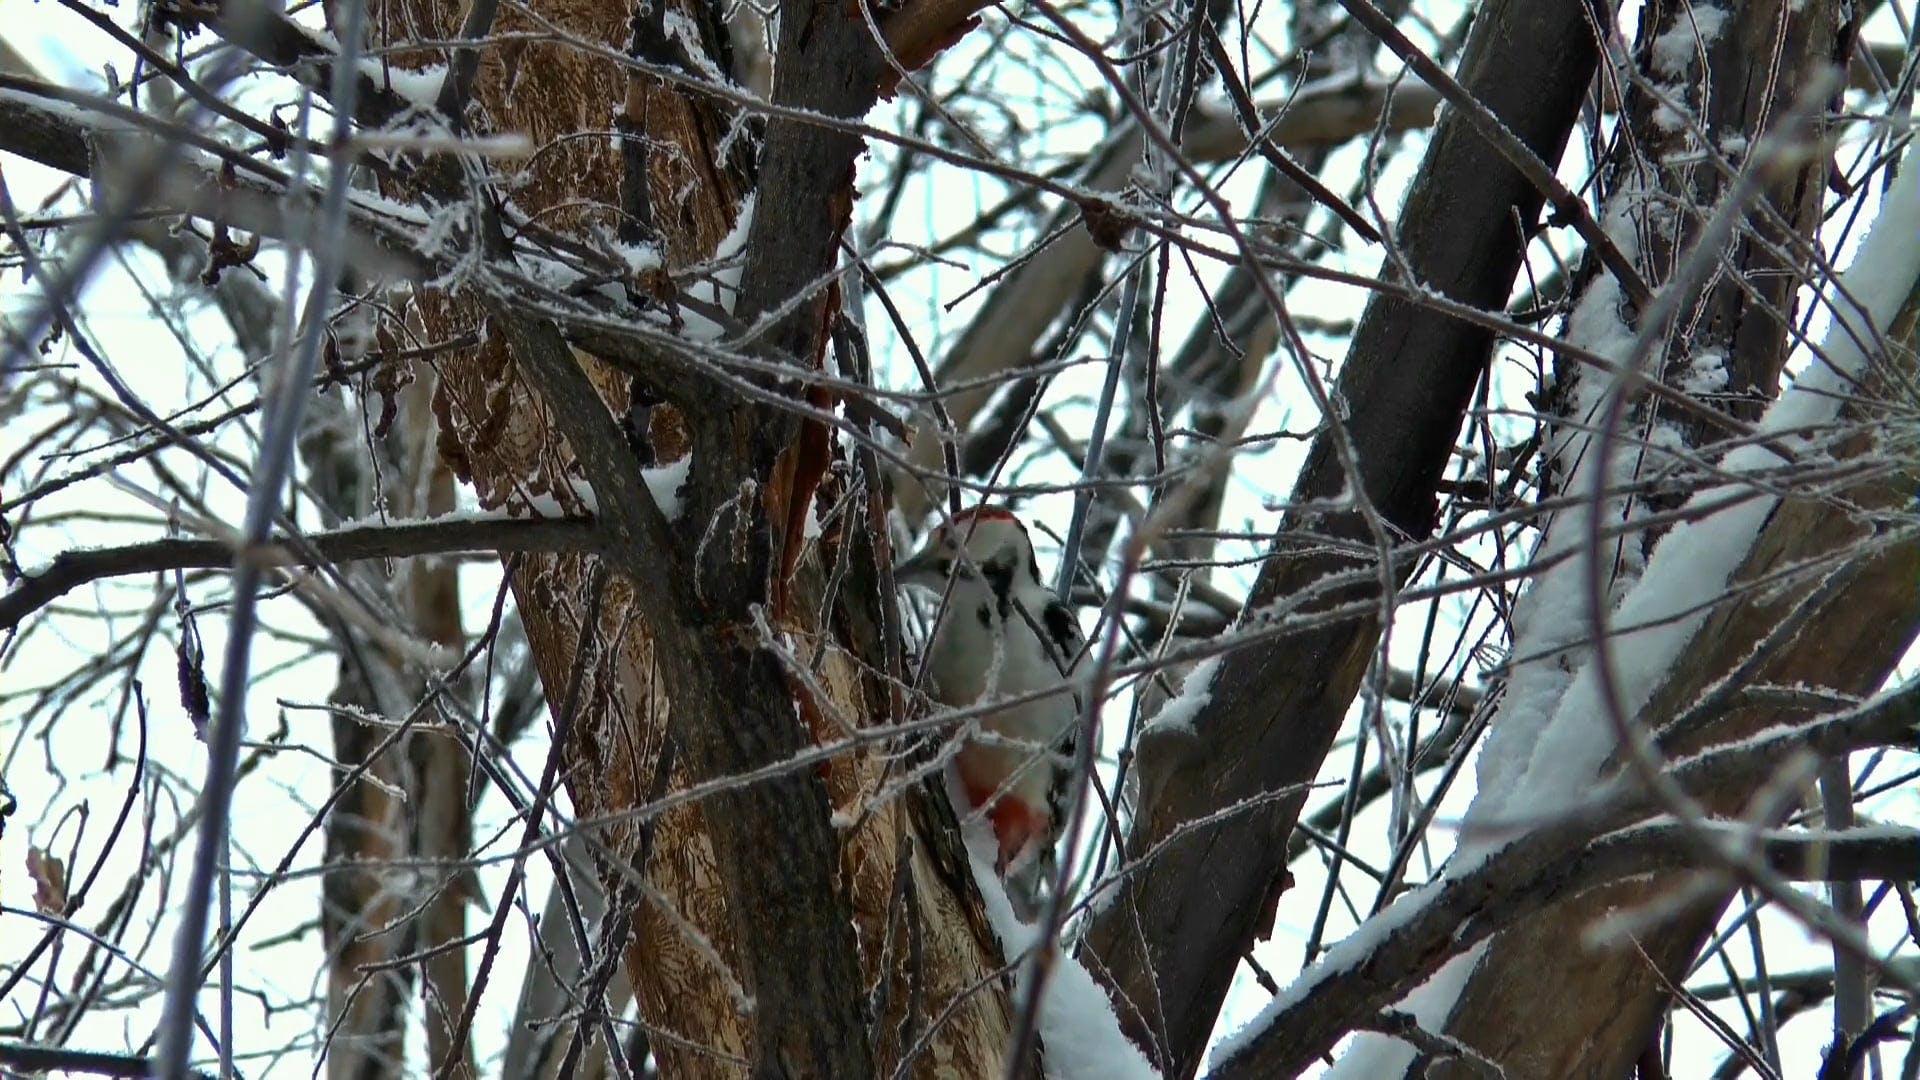 Video Of A Woodpecker